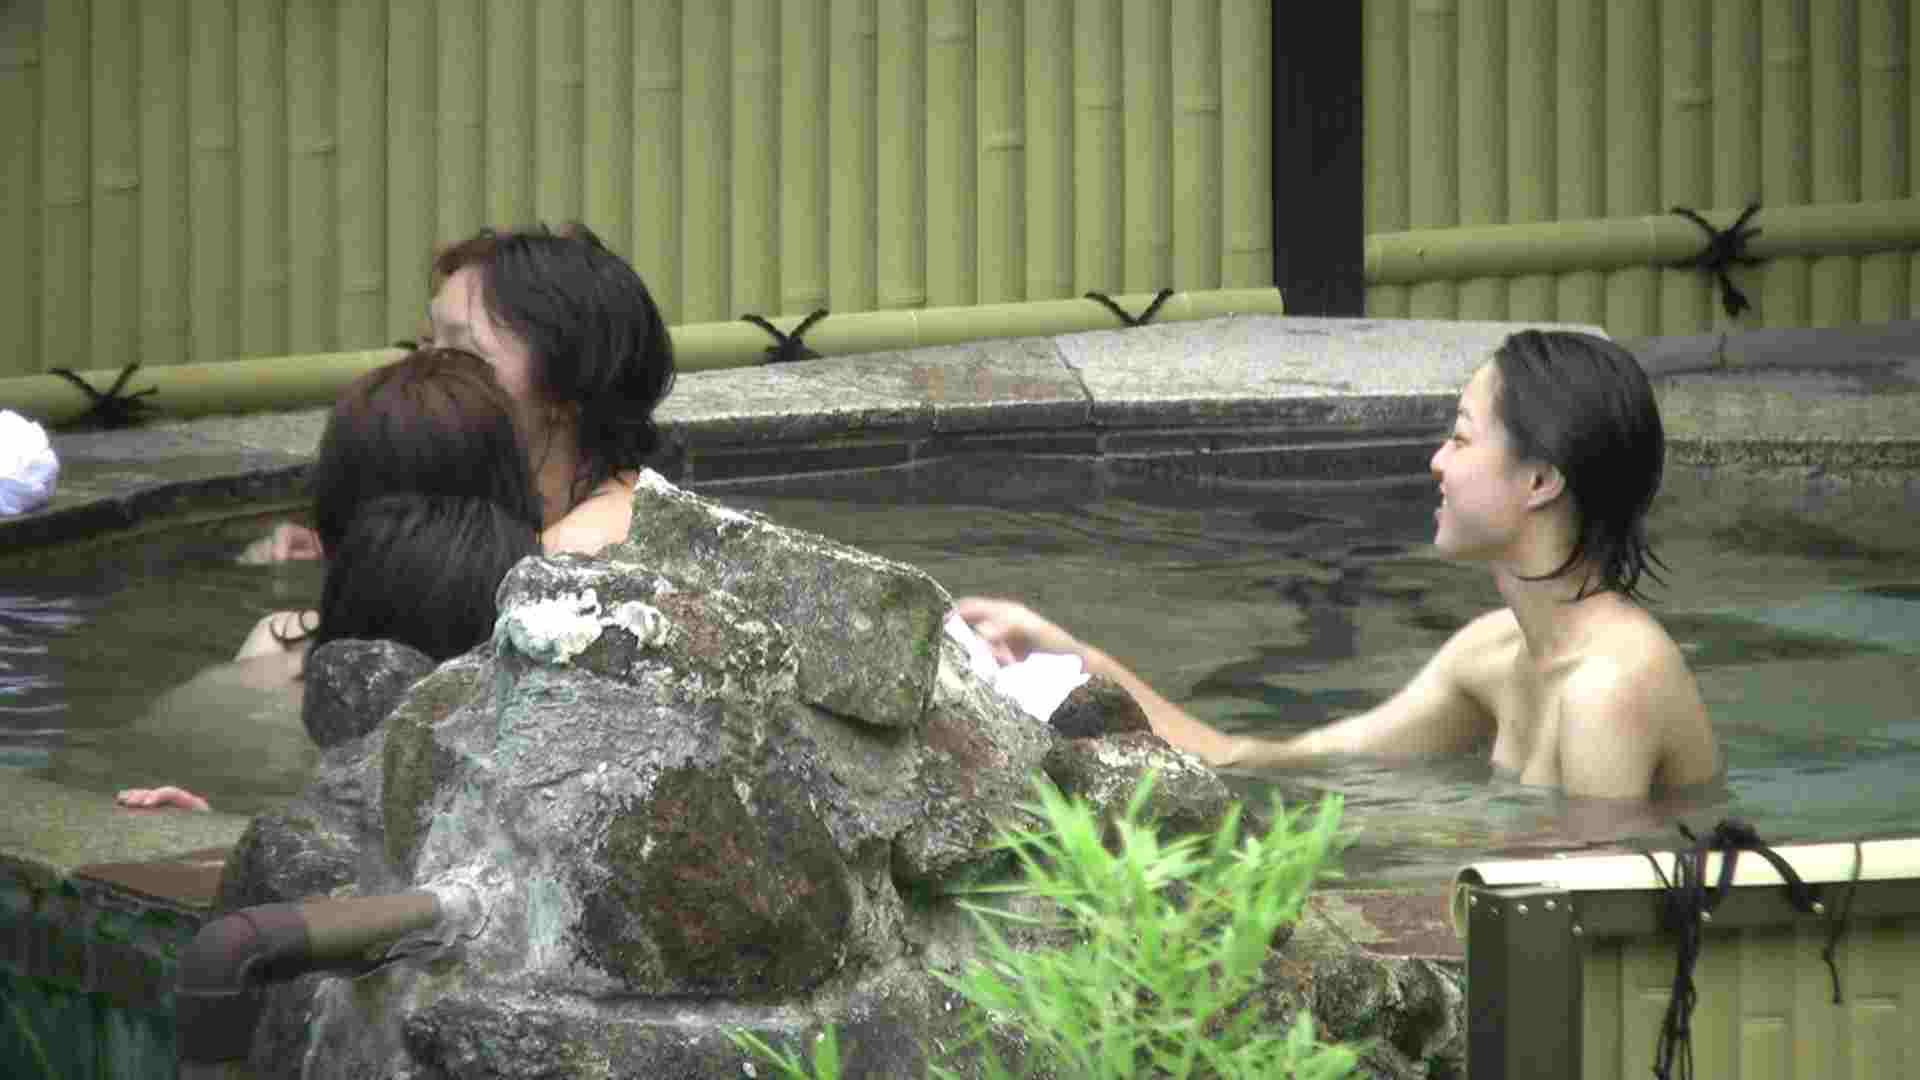 Aquaな露天風呂Vol.181 OLのエロ生活 | 露天風呂  40連発 22